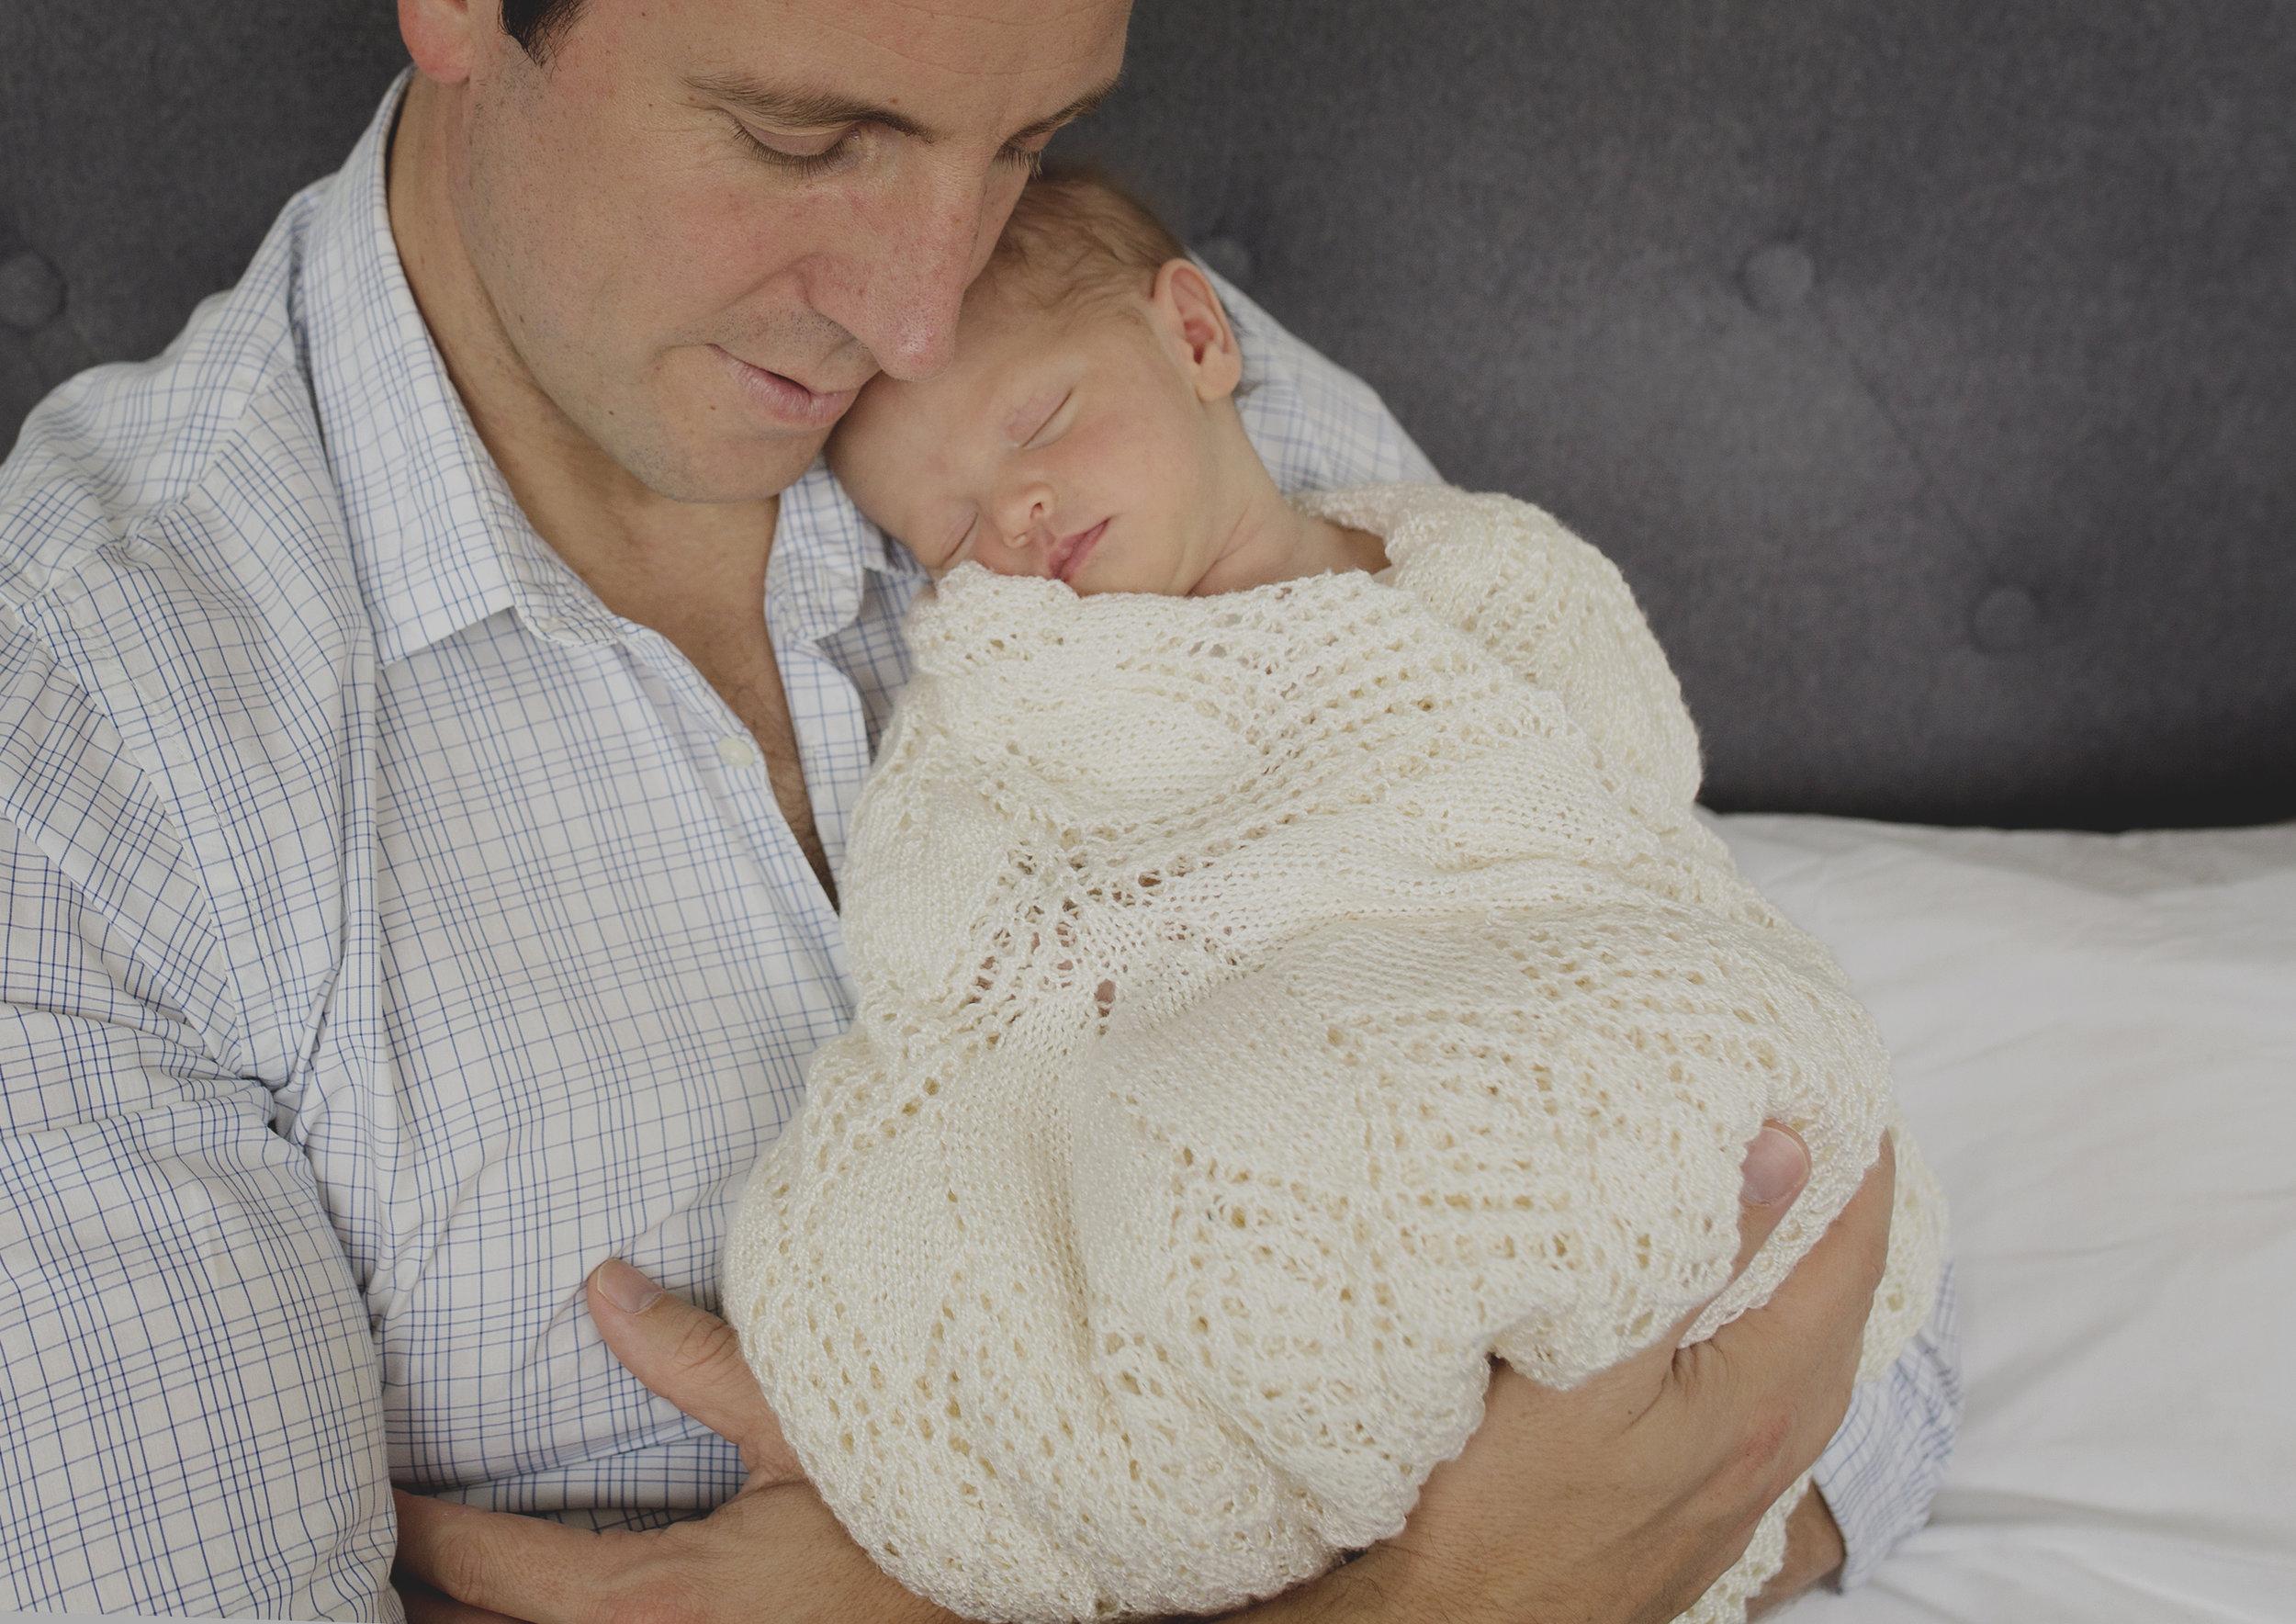 Newborn baby girl nestling into her father